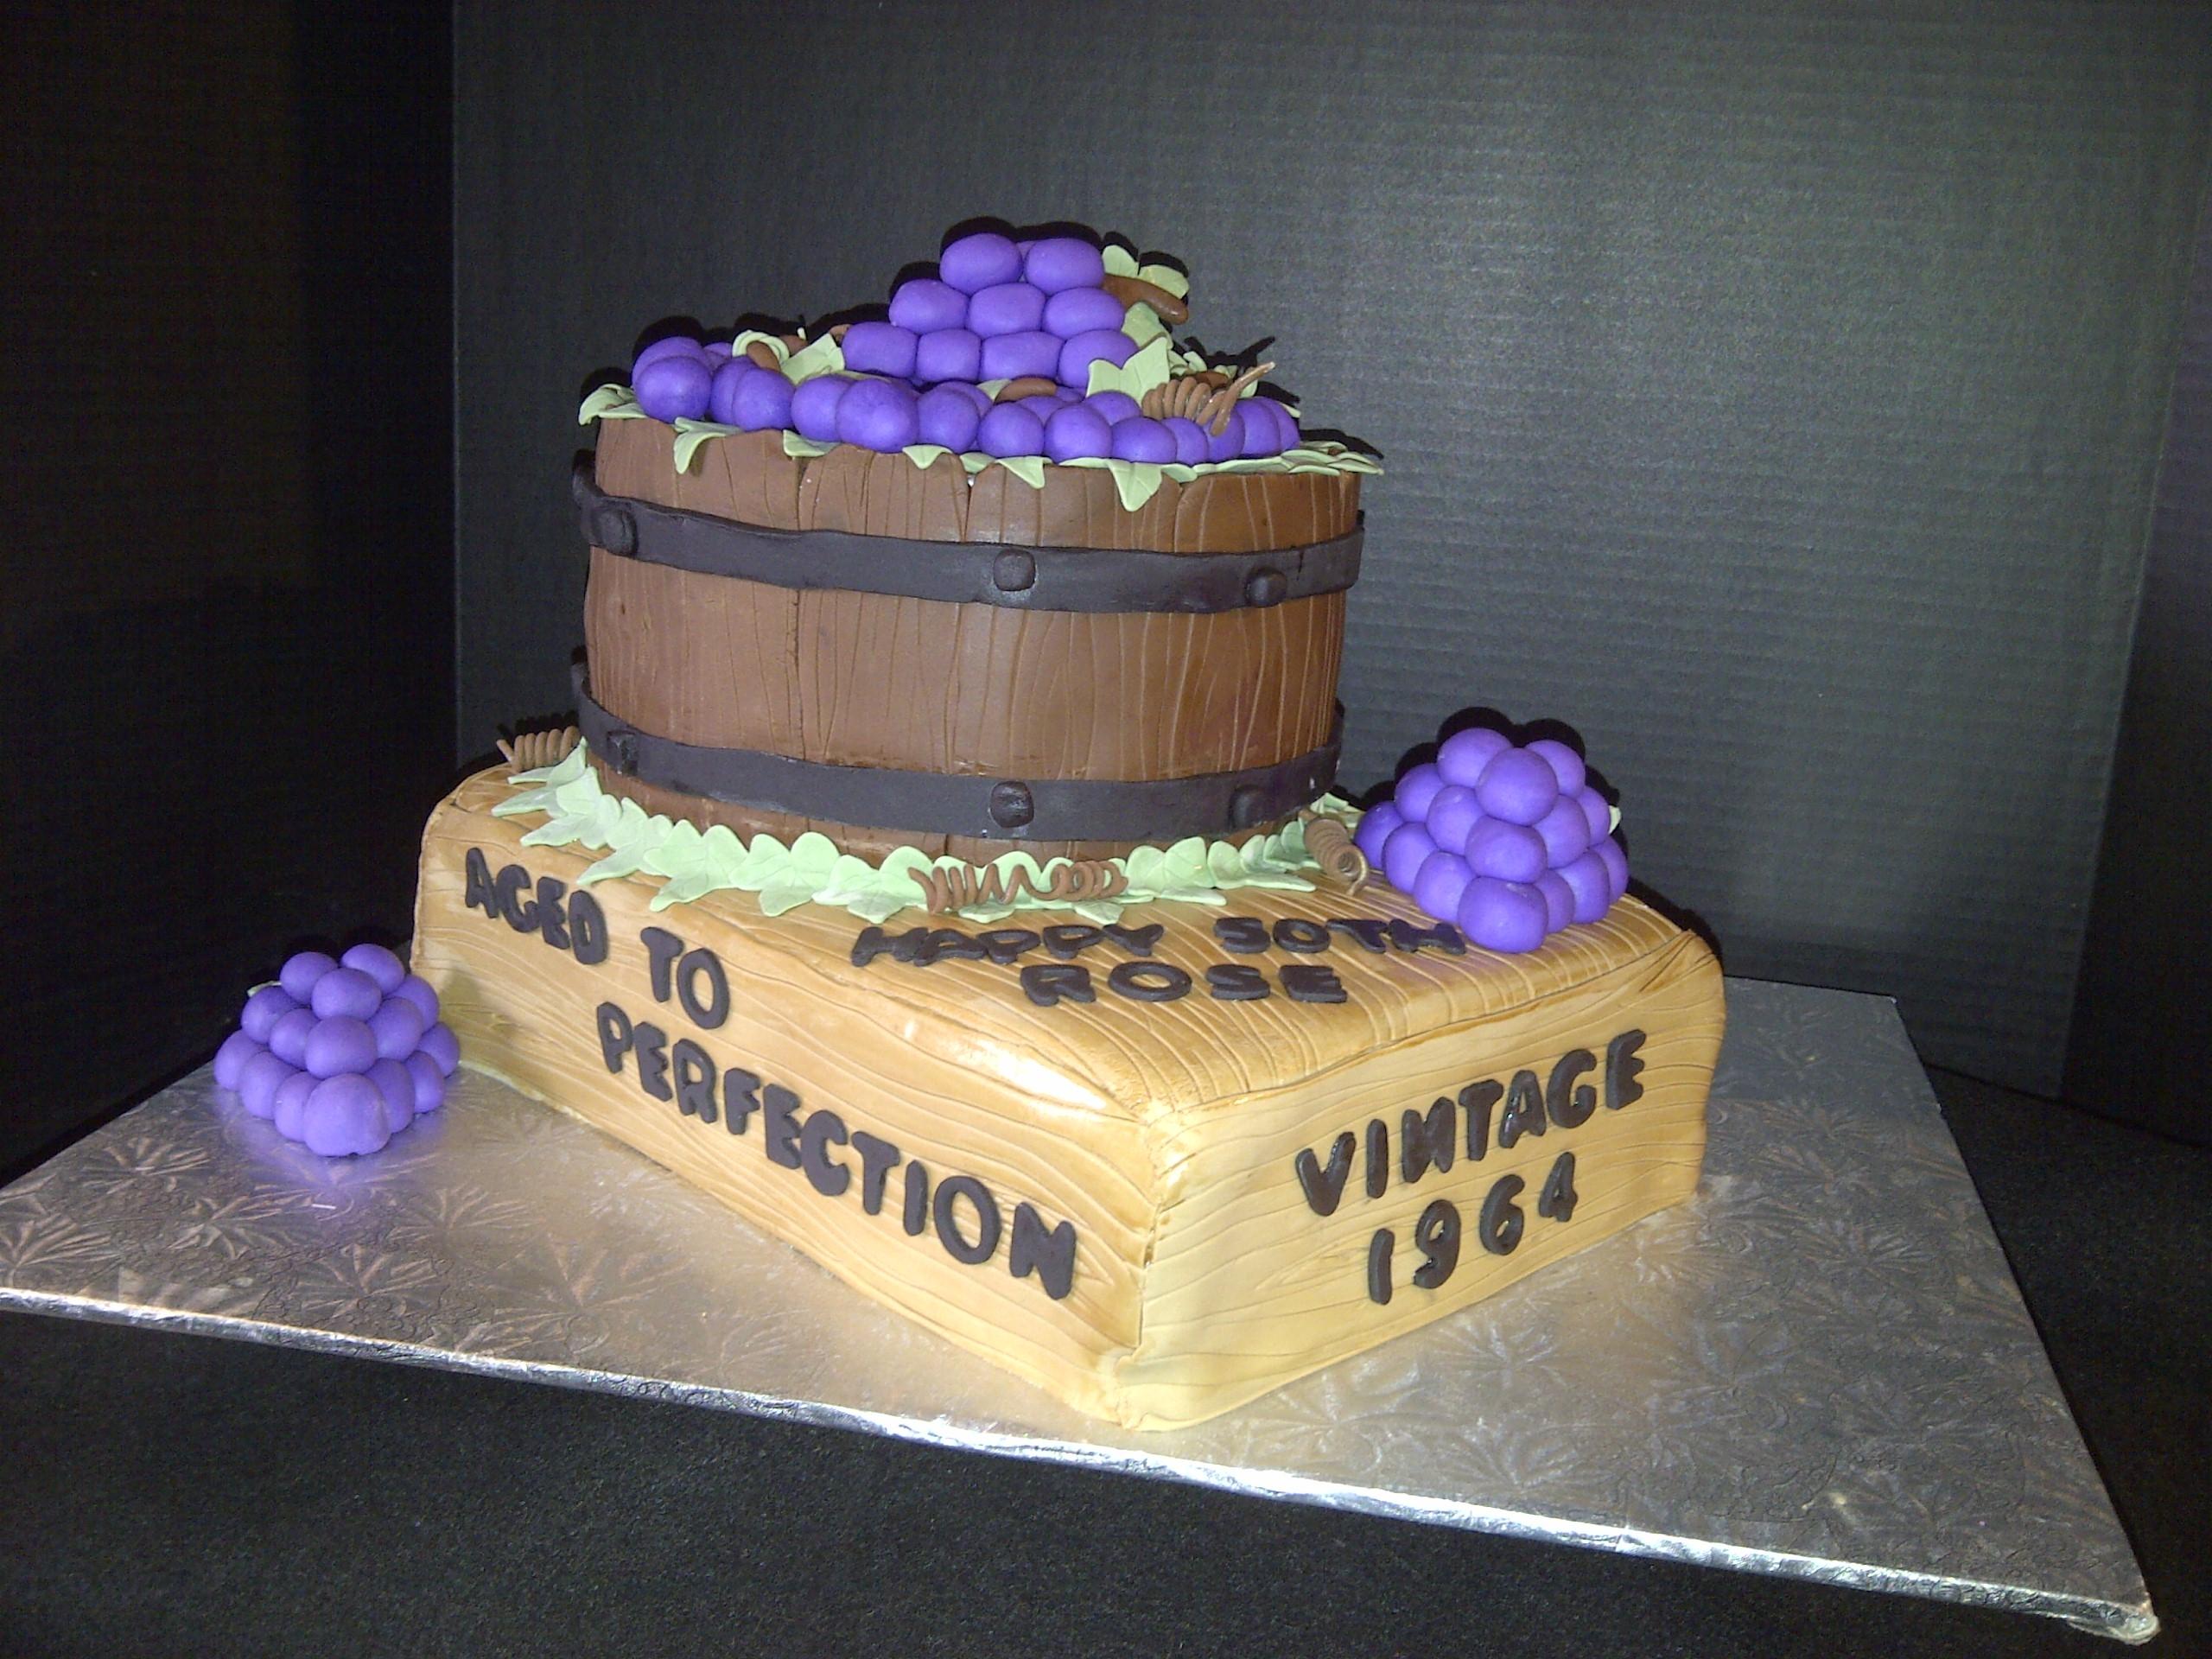 Enjoyable Wine And Grapes Themed Birthday Cake Cakecentral Com Funny Birthday Cards Online Ioscodamsfinfo